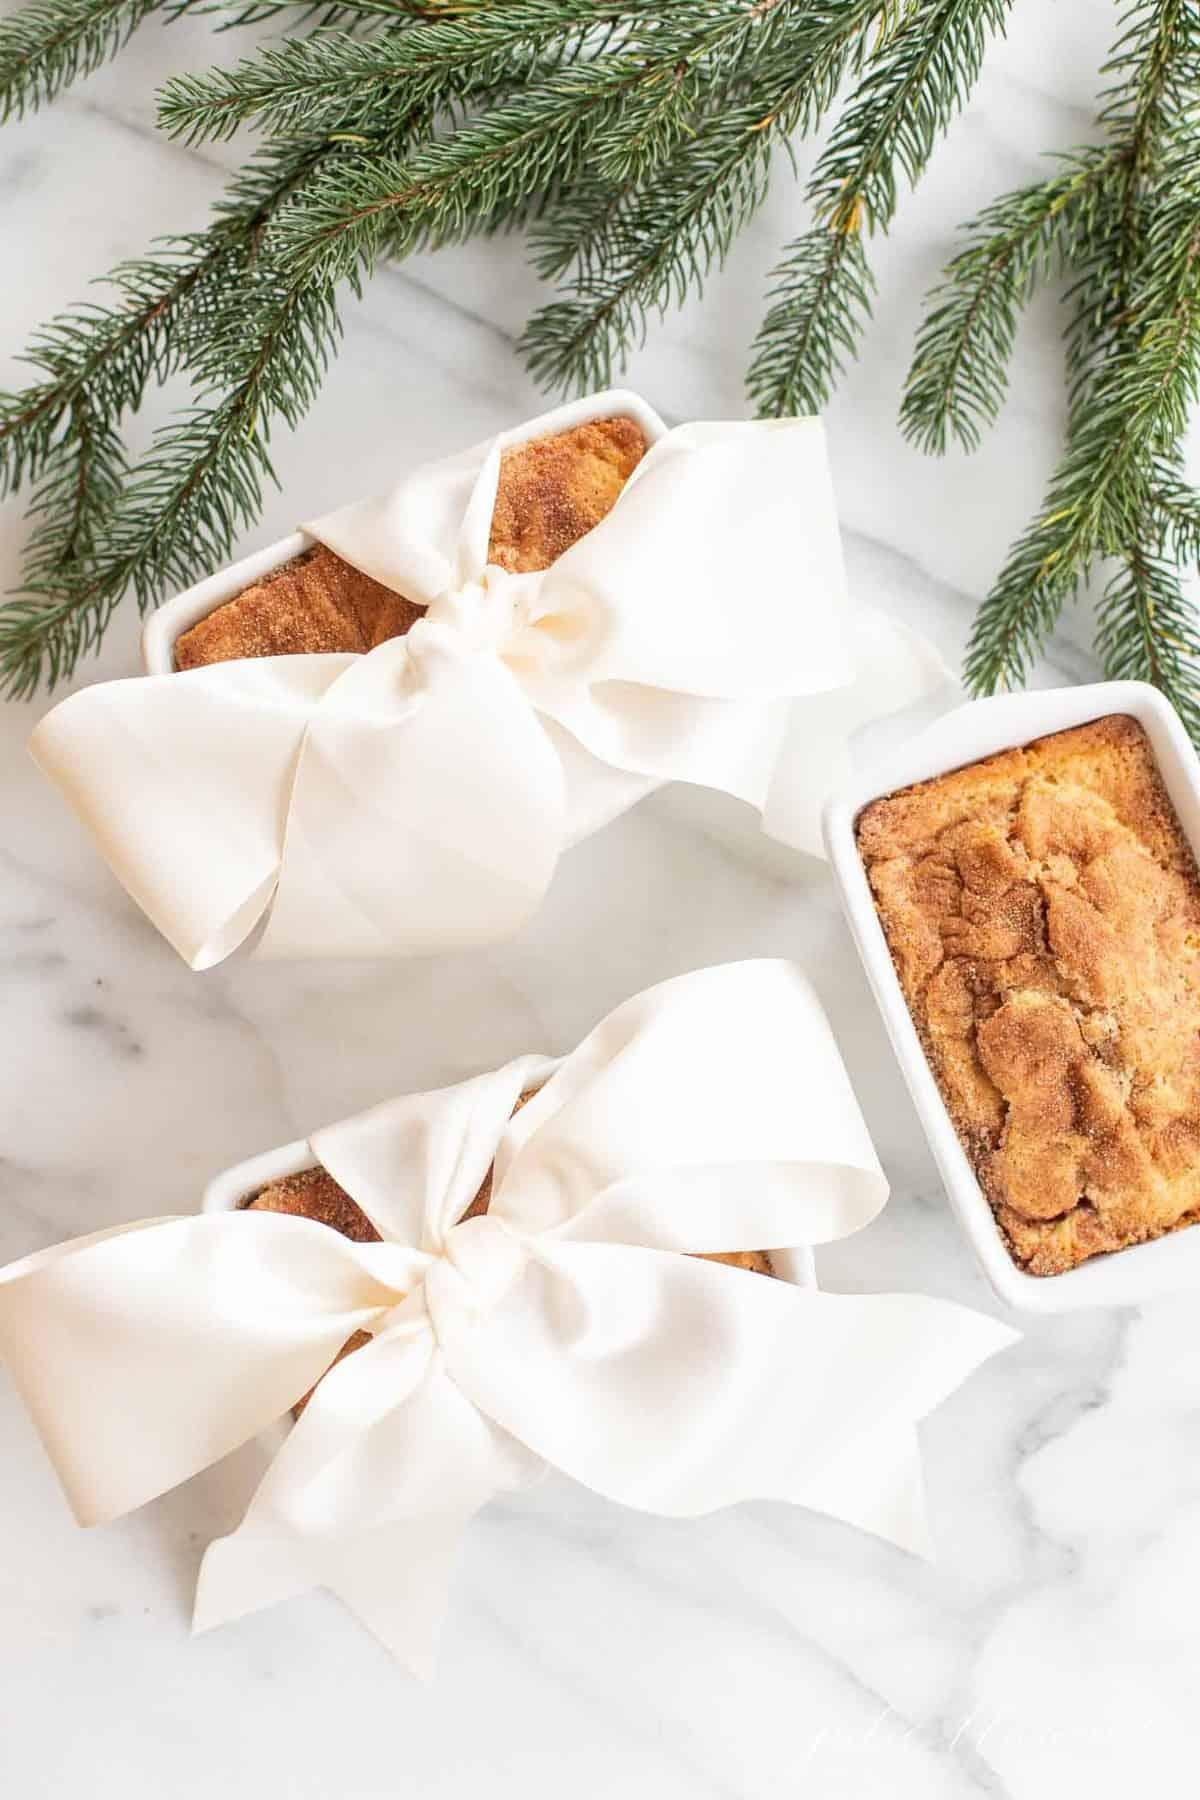 5 Minute Cinnamon Bread An Amazing Christmas Bread Julie Blanner